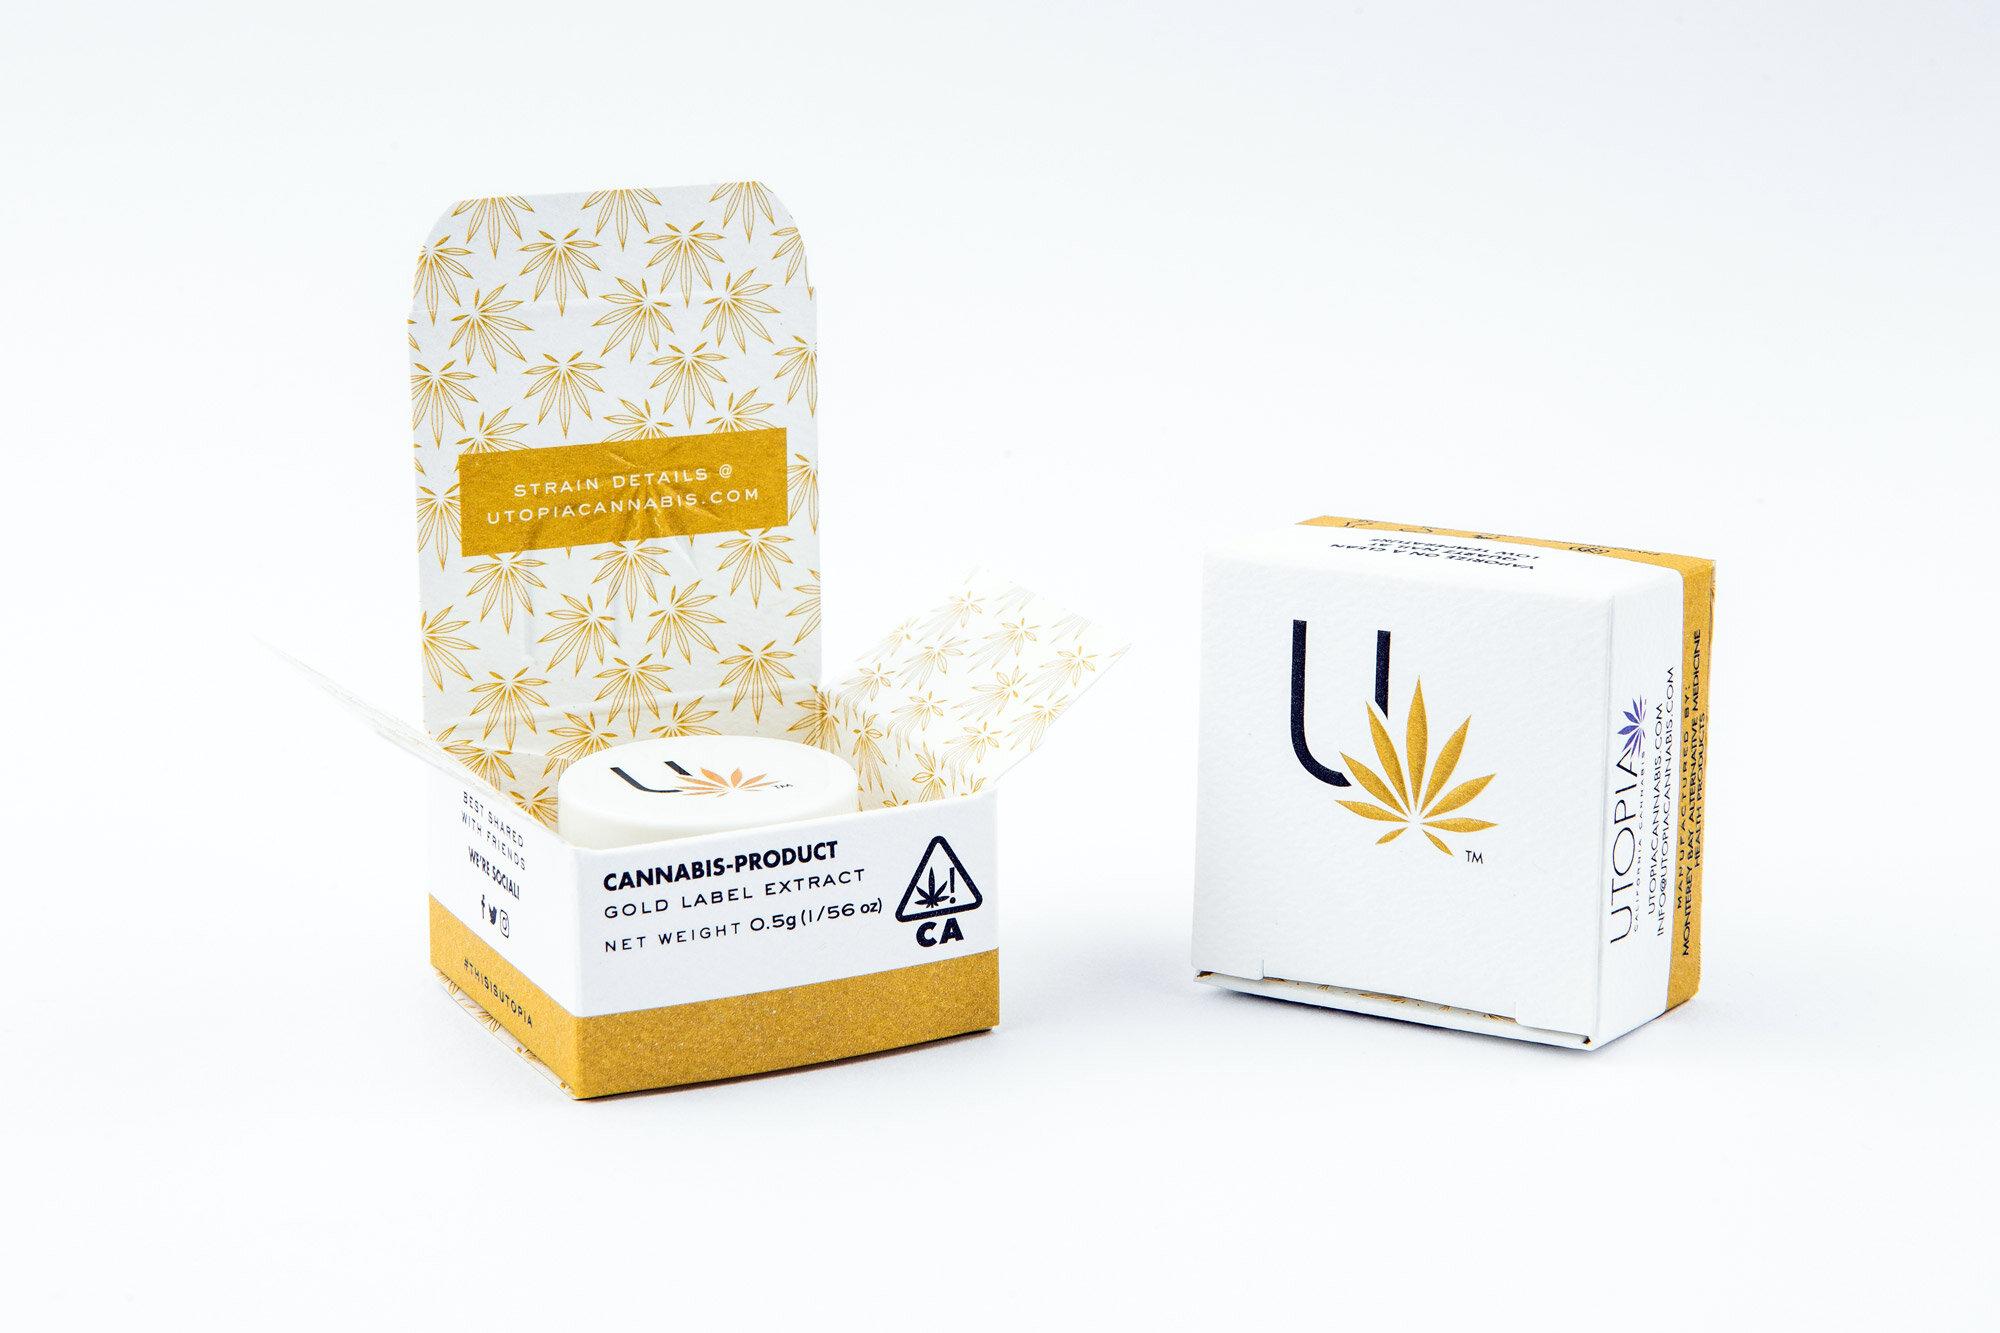 Utopia_cannabis_packaging.jpg